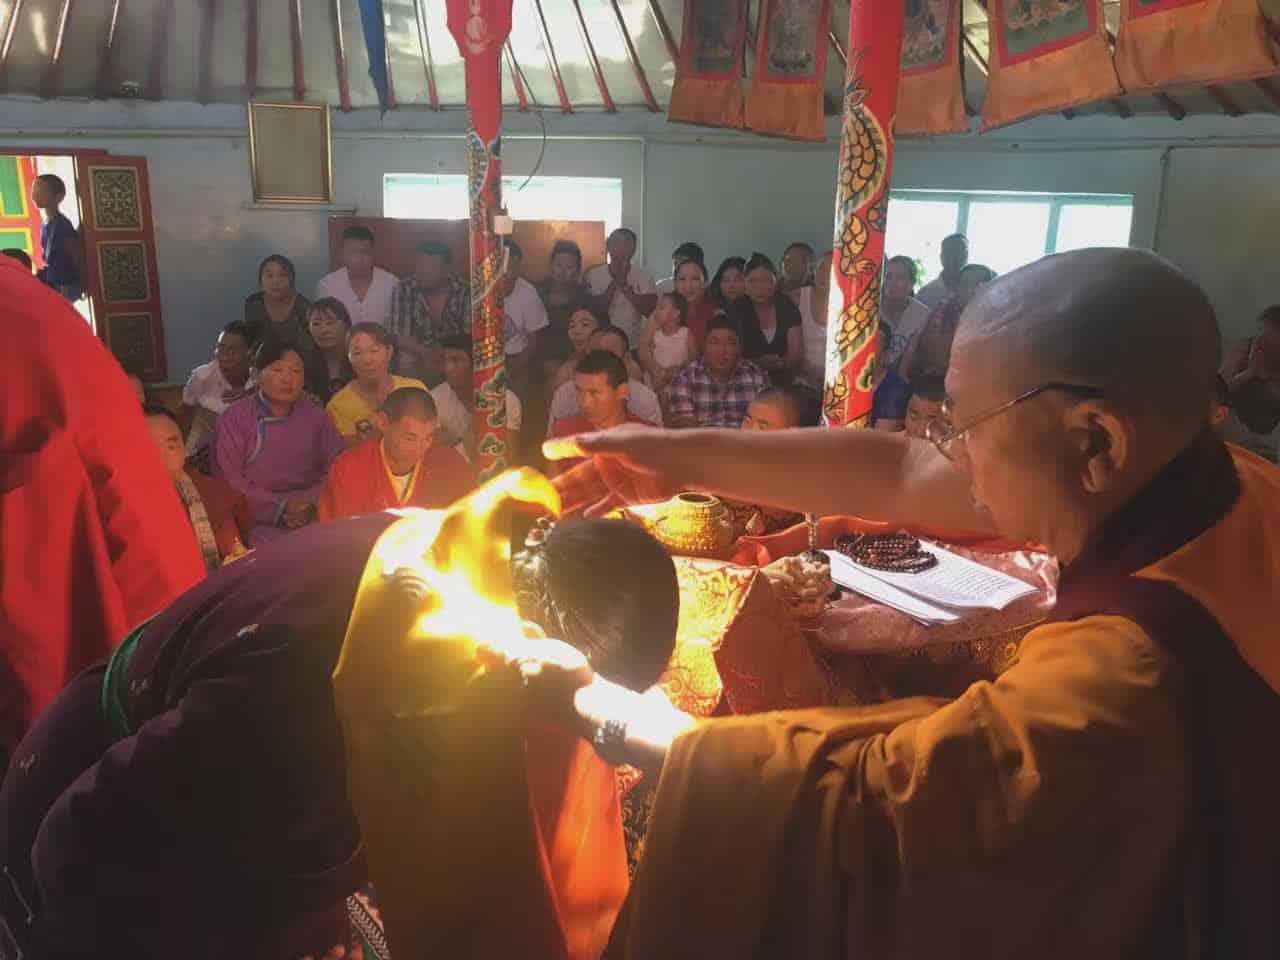 gosok-rinpoche-mongolia-2016-d14d2f74a19c42c72a9ebeb891f89e6